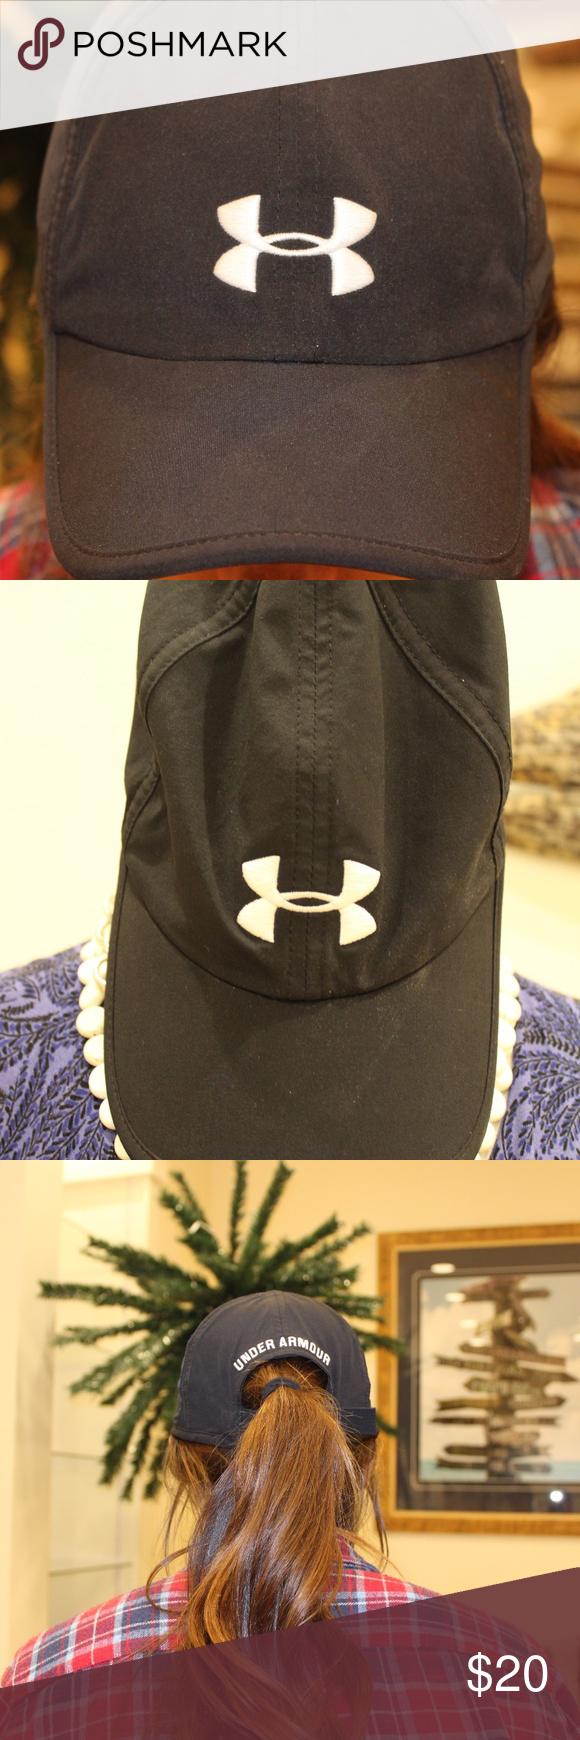 Under Armour Hat Black Hat White Under Armor Symbol Never Been Worn